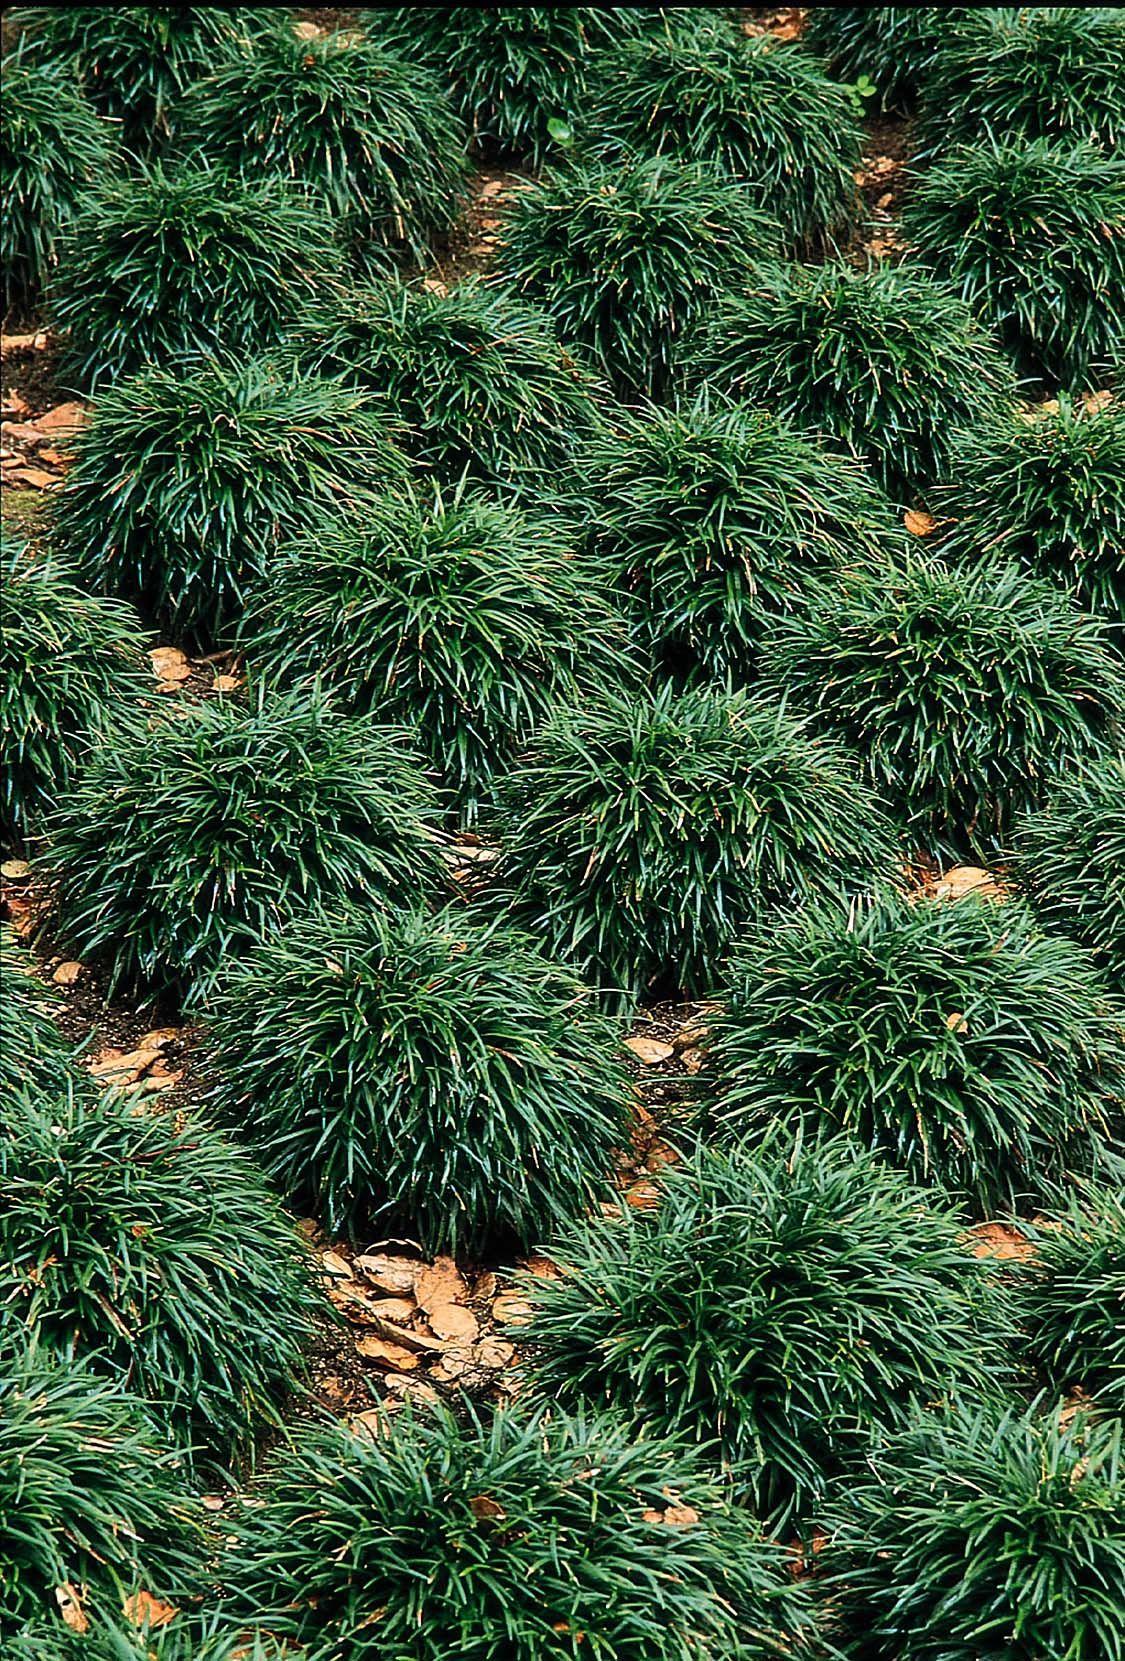 Dwarf Grasses Landscaping Dwarf mondo grass easy care 4 6 clumps house landscaping dwarf mondo grass easy care 4 6 clumps workwithnaturefo